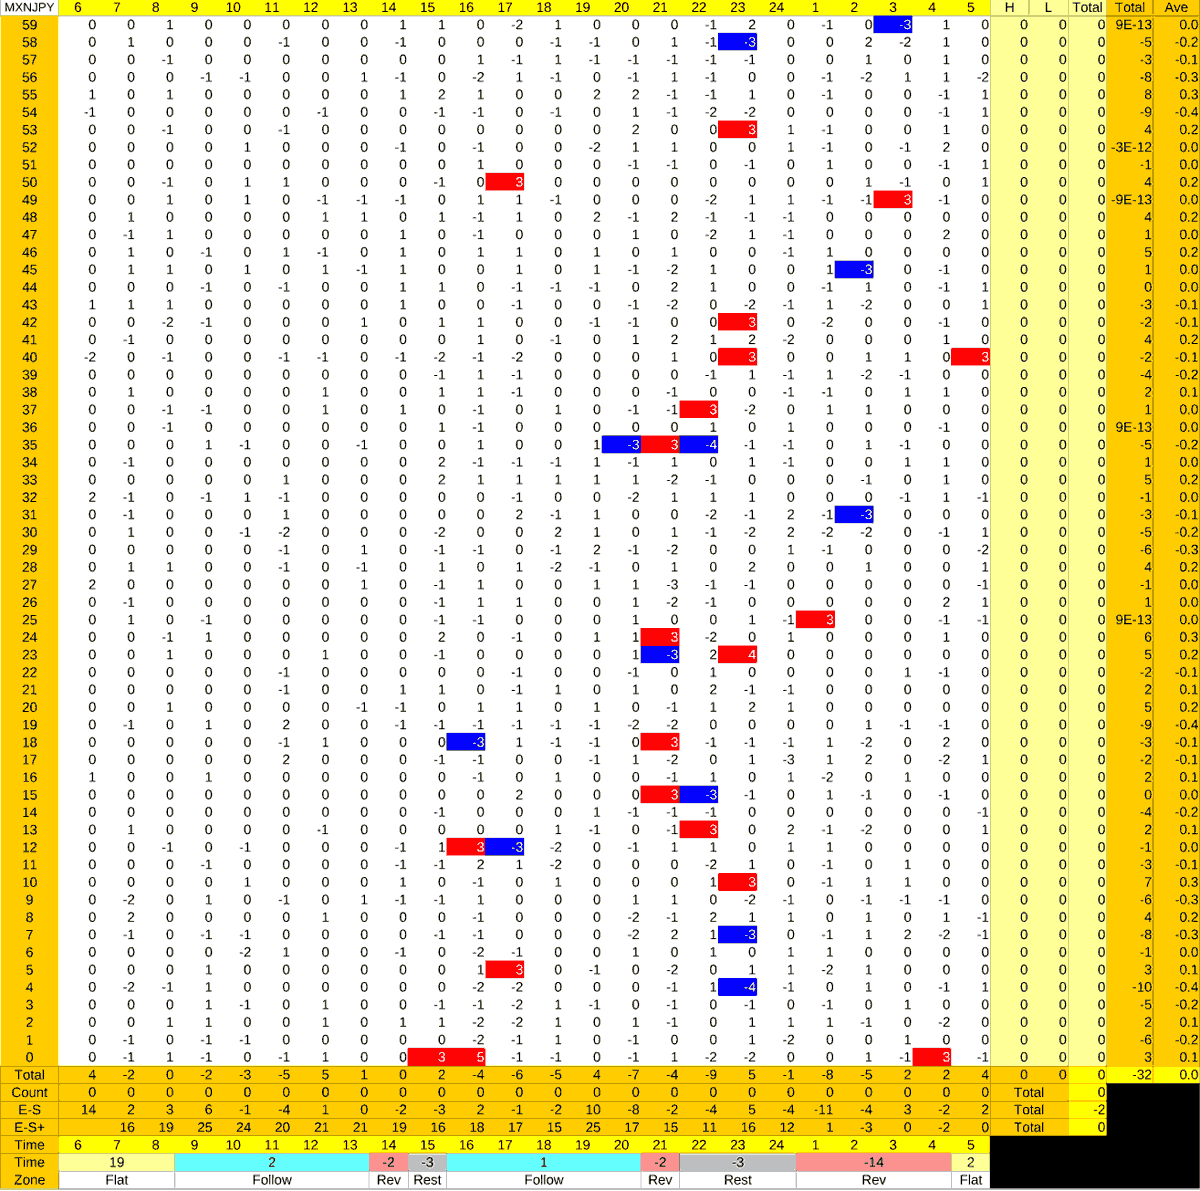 20210505_HS(3)MXNJPY